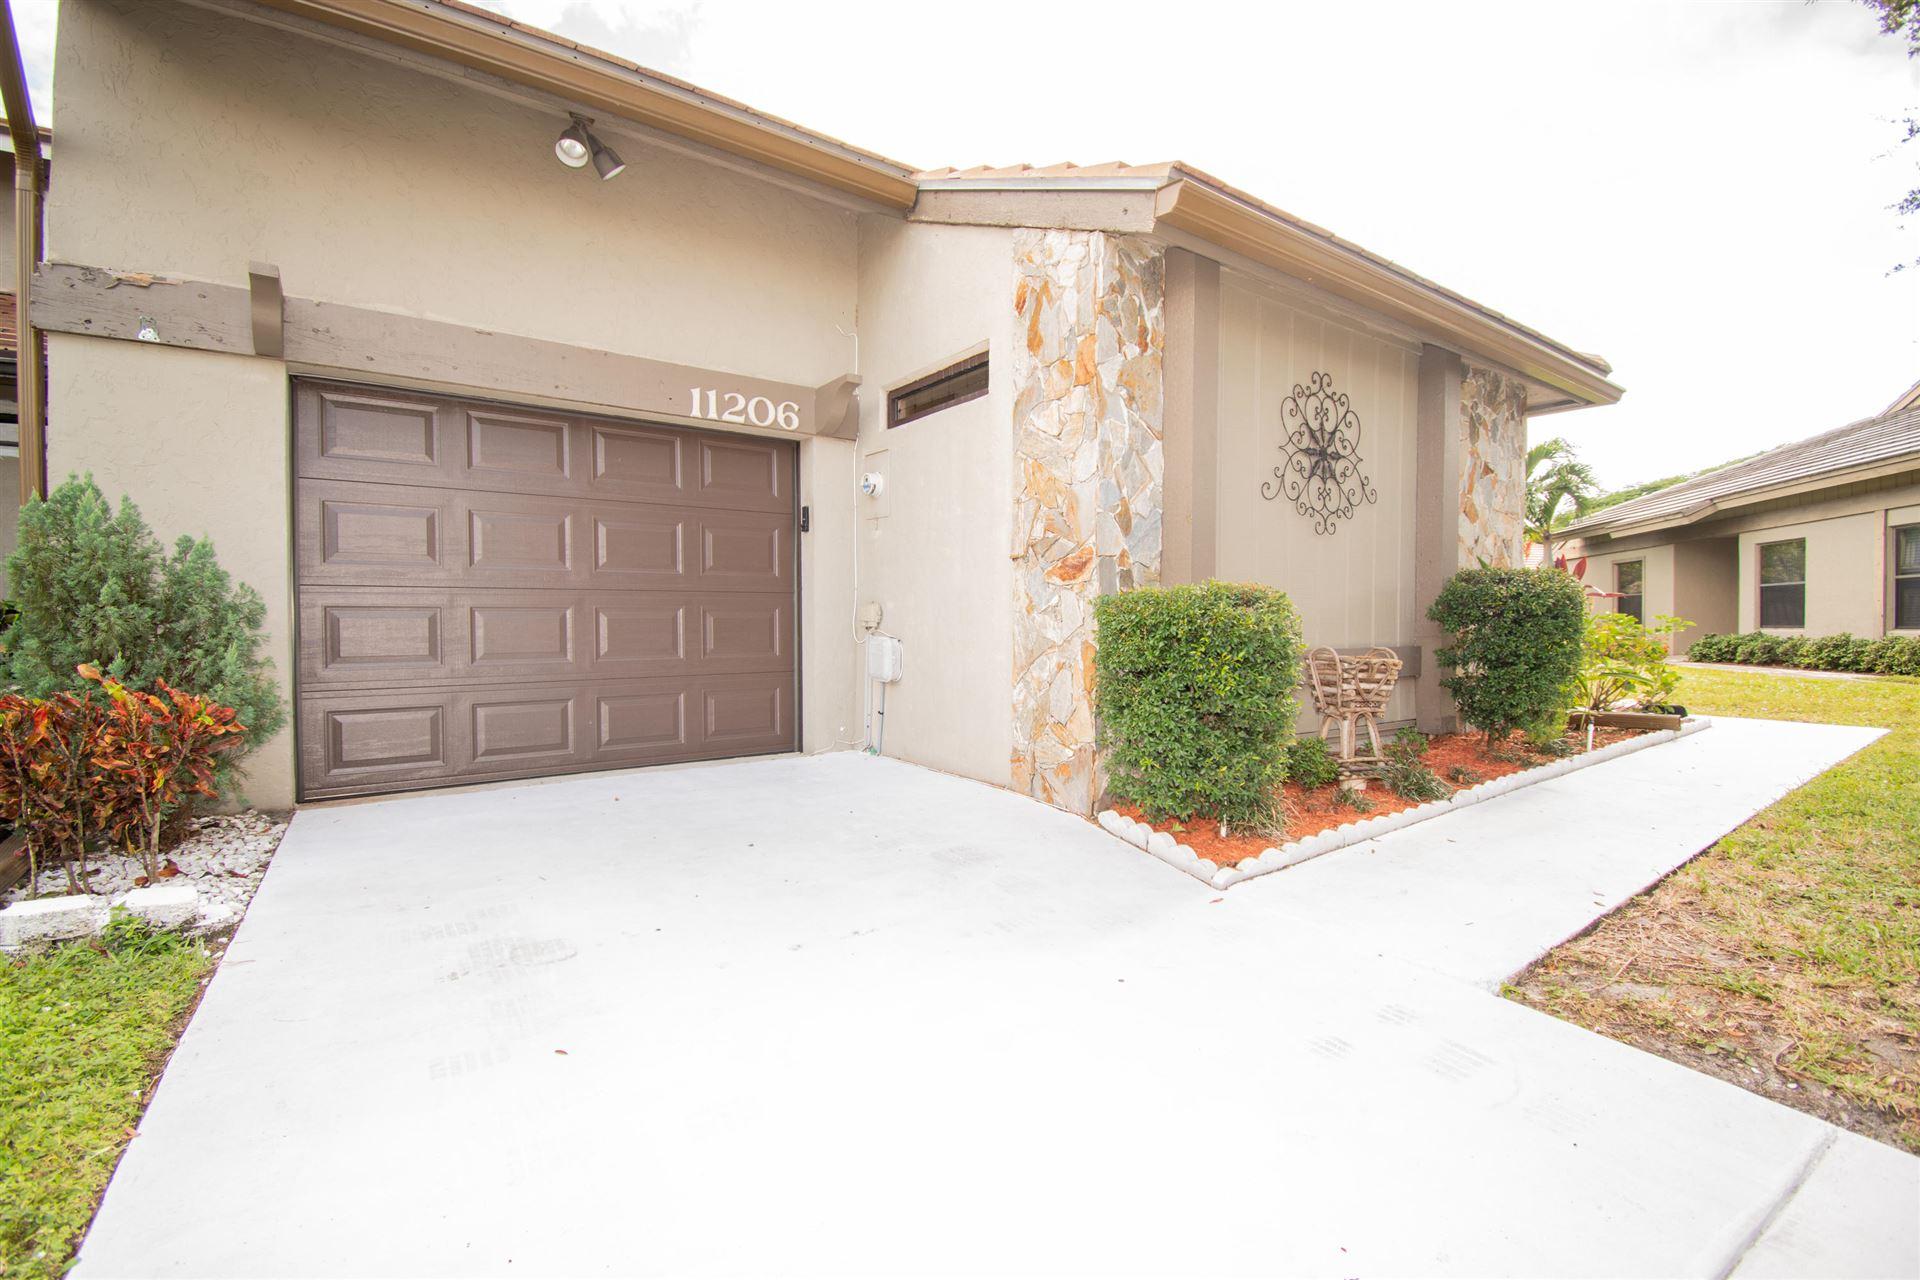 Photo of 11206 Marjoram Drive, Palm Beach Gardens, FL 33418 (MLS # RX-10667505)